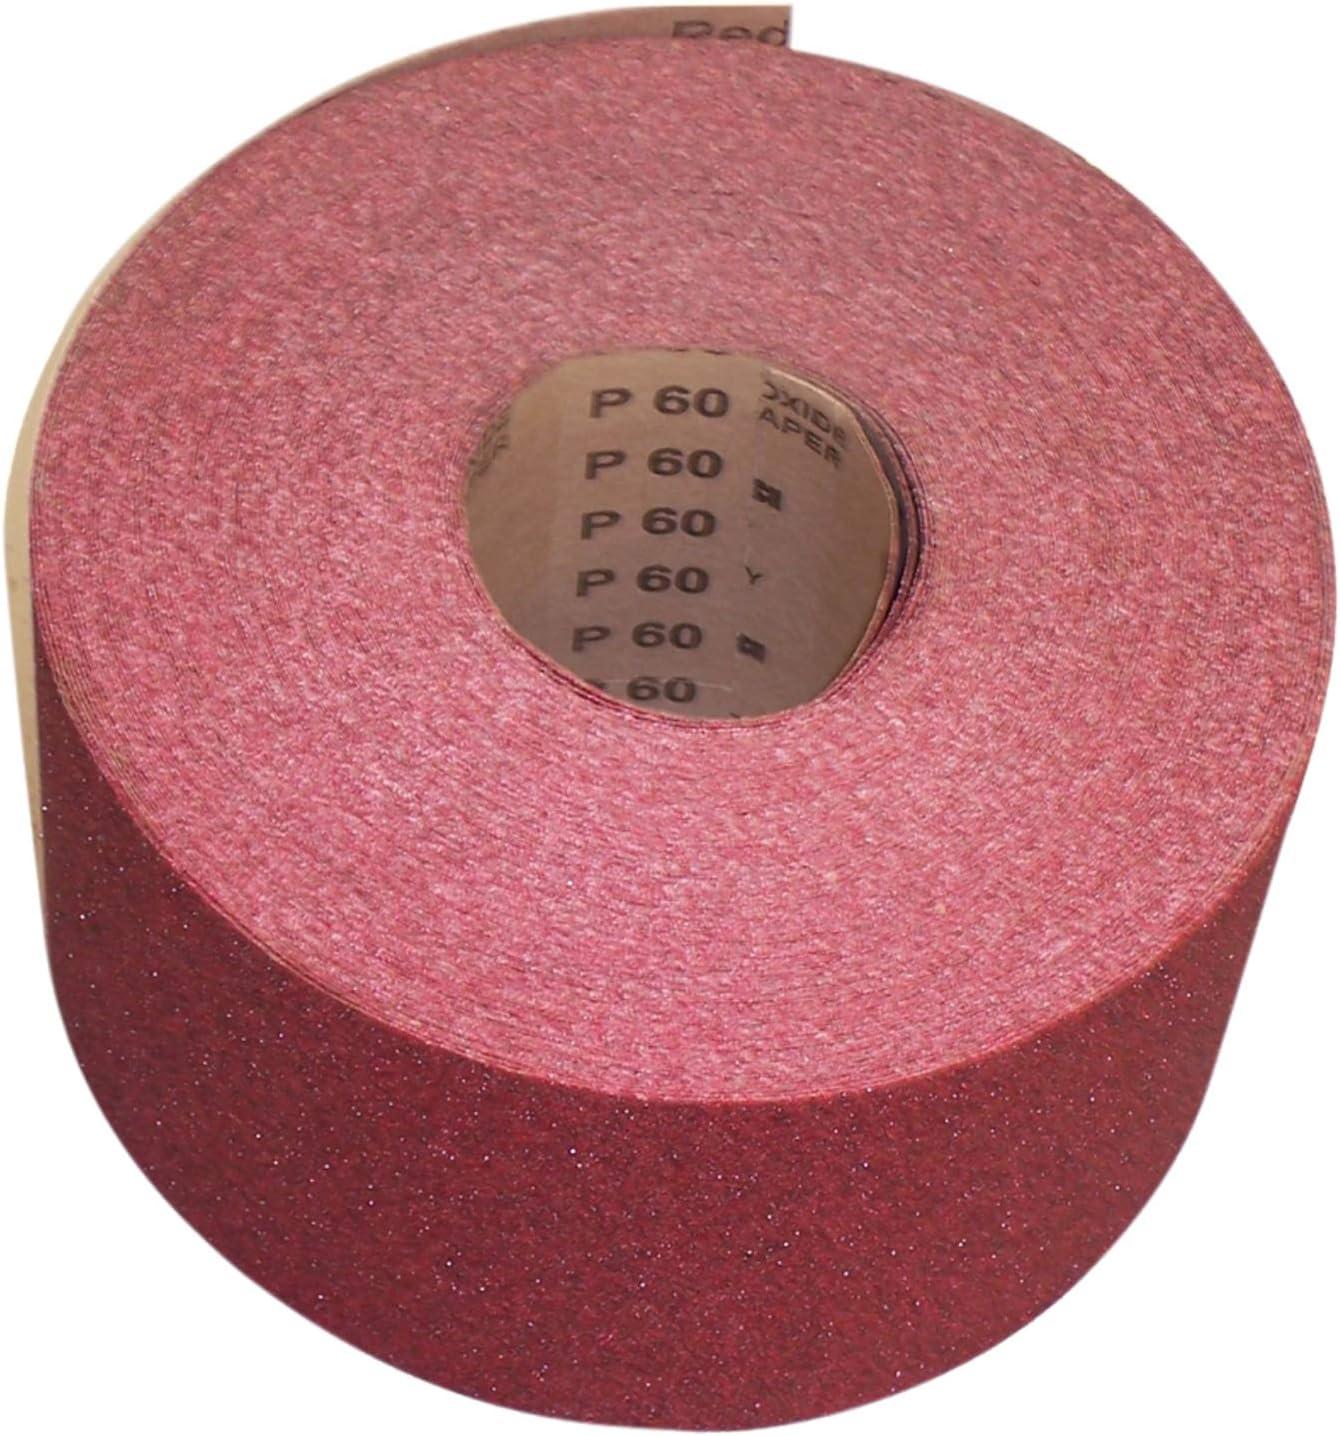 Papel de Lija Eckra 1 Rollo Red 115 mm X 50M Grano 240